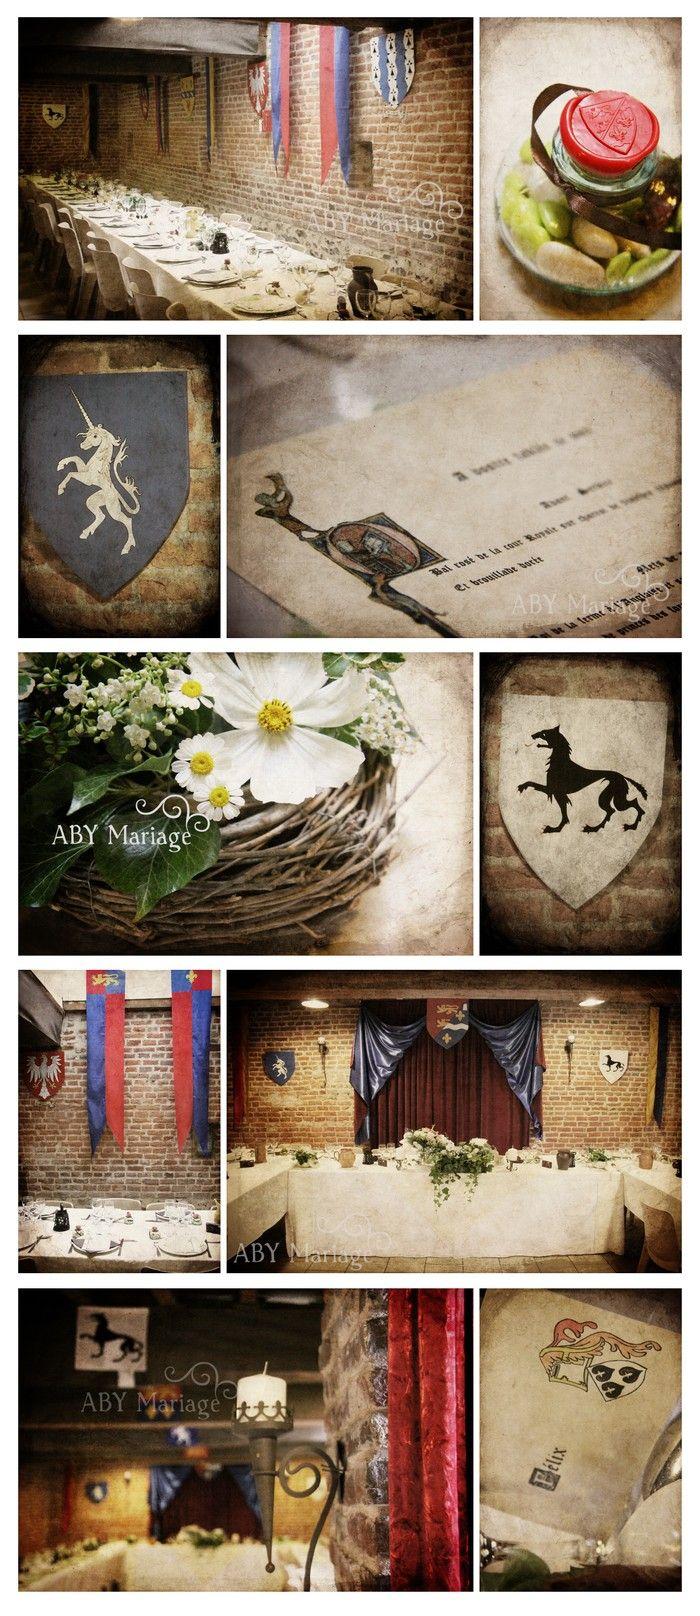 ... mariages/public/2011/septembre/mariage_banquet_medieval_normandie.jpg